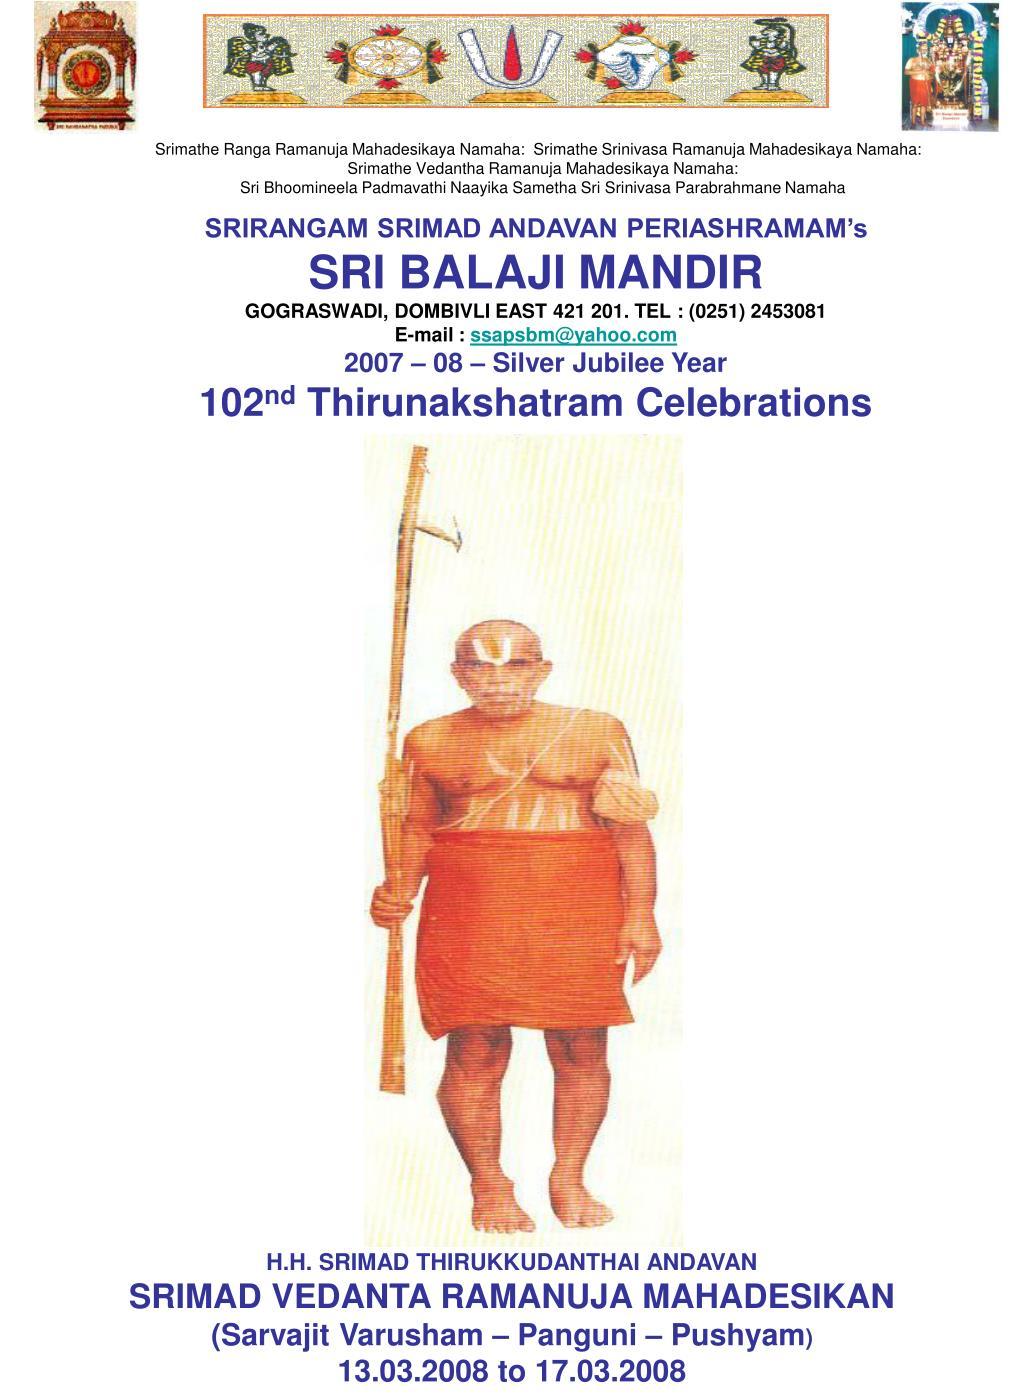 Srimathe Ranga Ramanuja Mahadesikaya Namaha:  Srimathe Srinivasa Ramanuja Mahadesikaya Namaha: